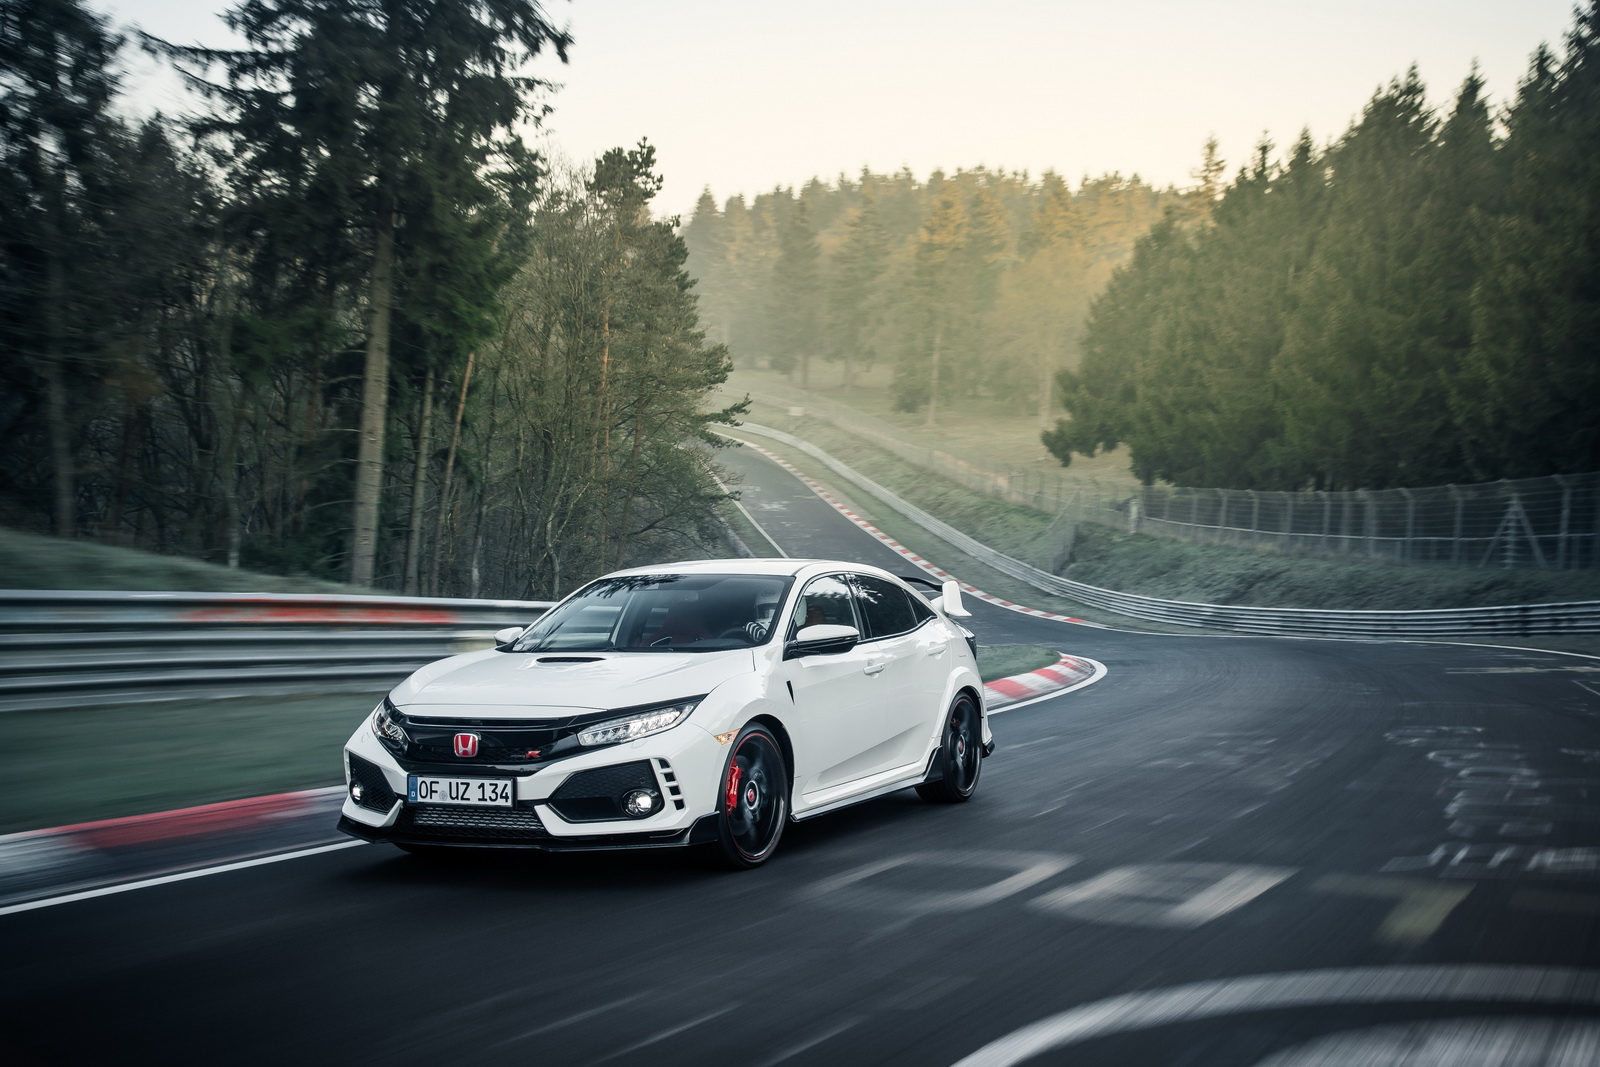 Honda Civic Type R MY 2017 - Record al Nurburgring